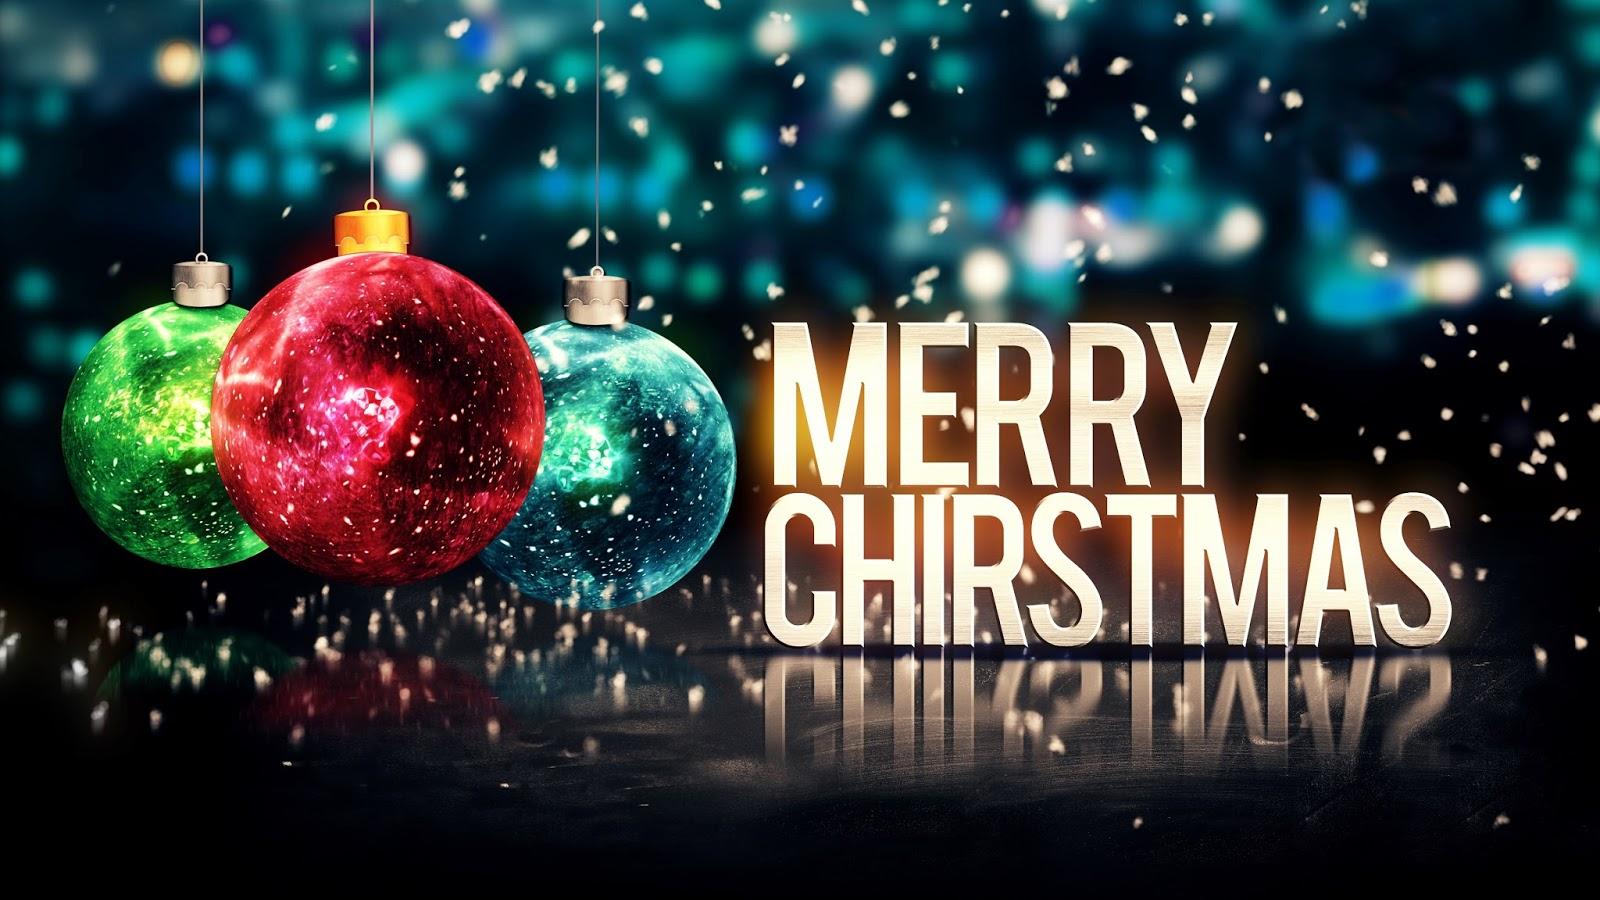 THE ROBIN BLOG: Best 12 Christmas SMS